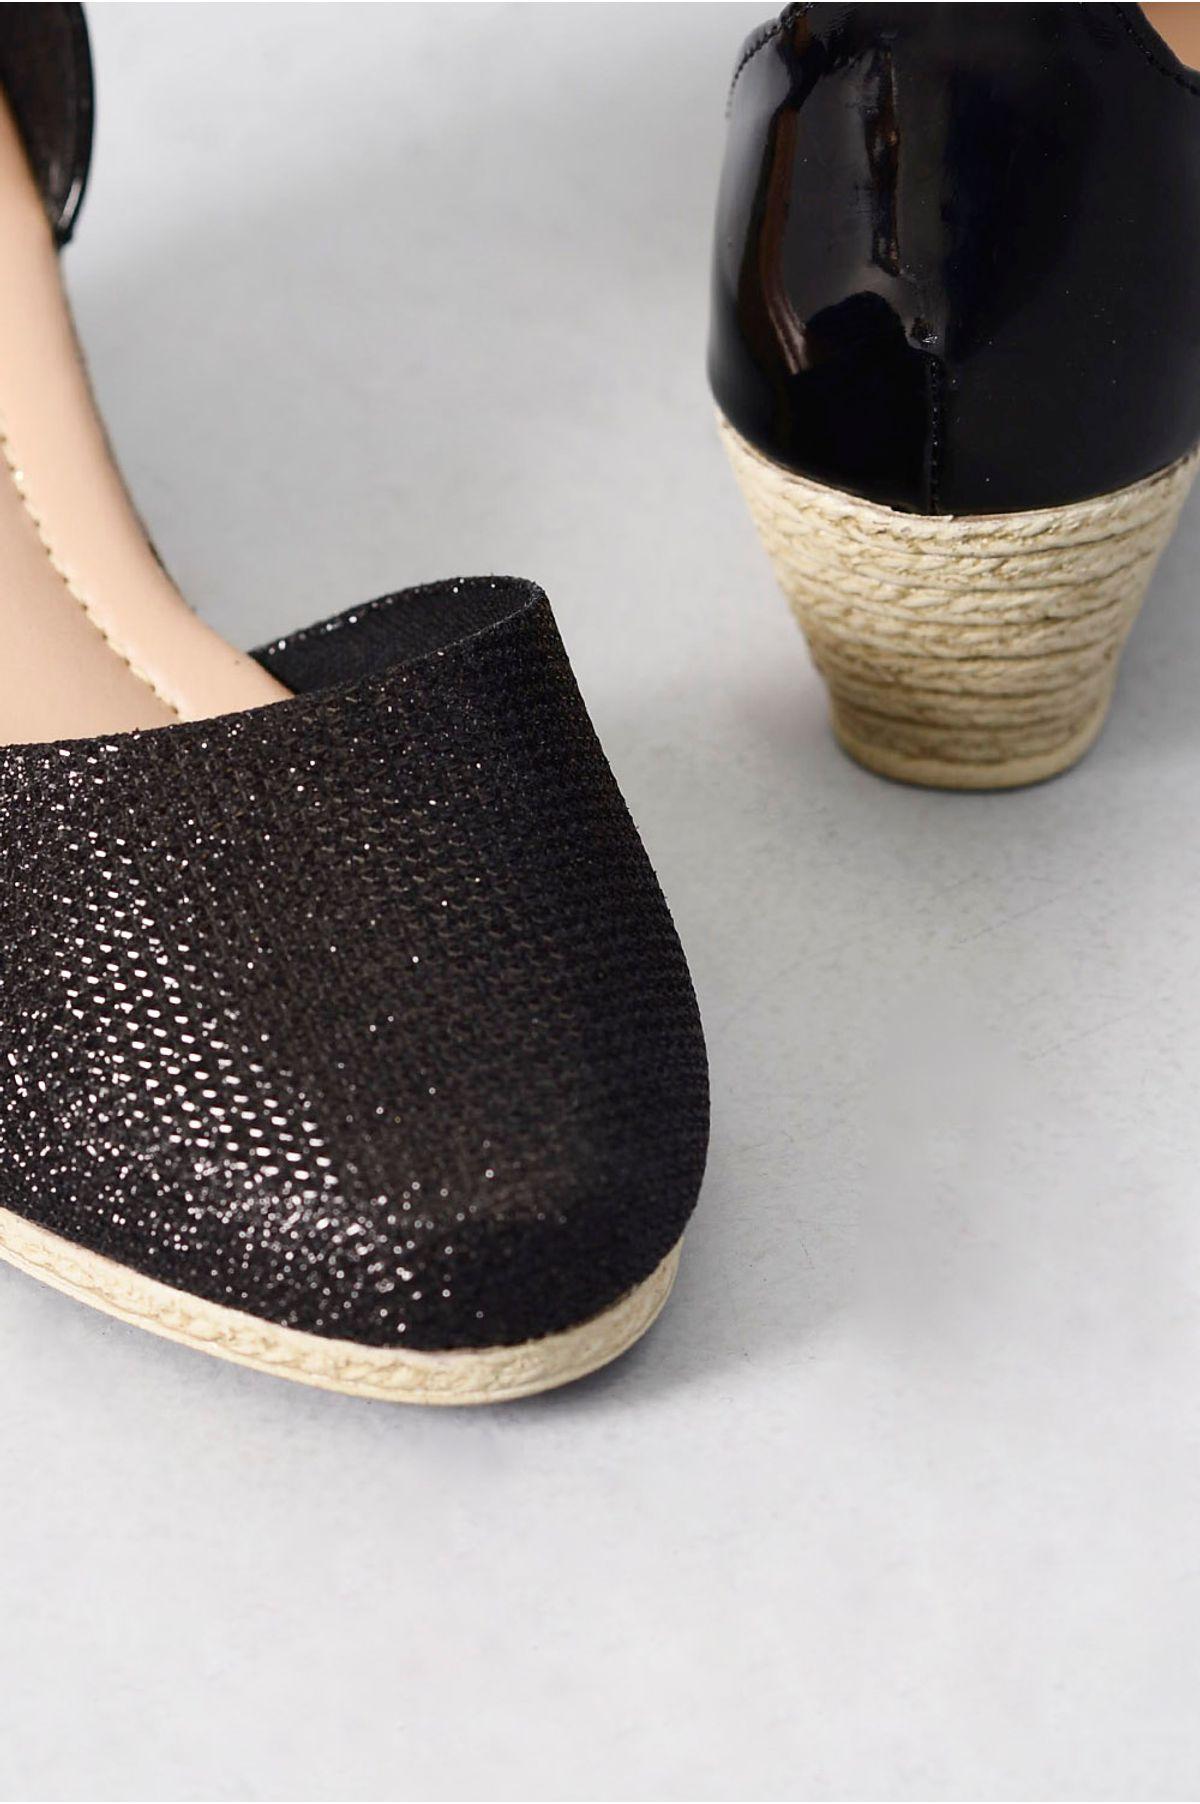 ad991caf0c4 Espadrille Infantil Mundial Eliza VERNIZ PRETO - Mundial Calçados